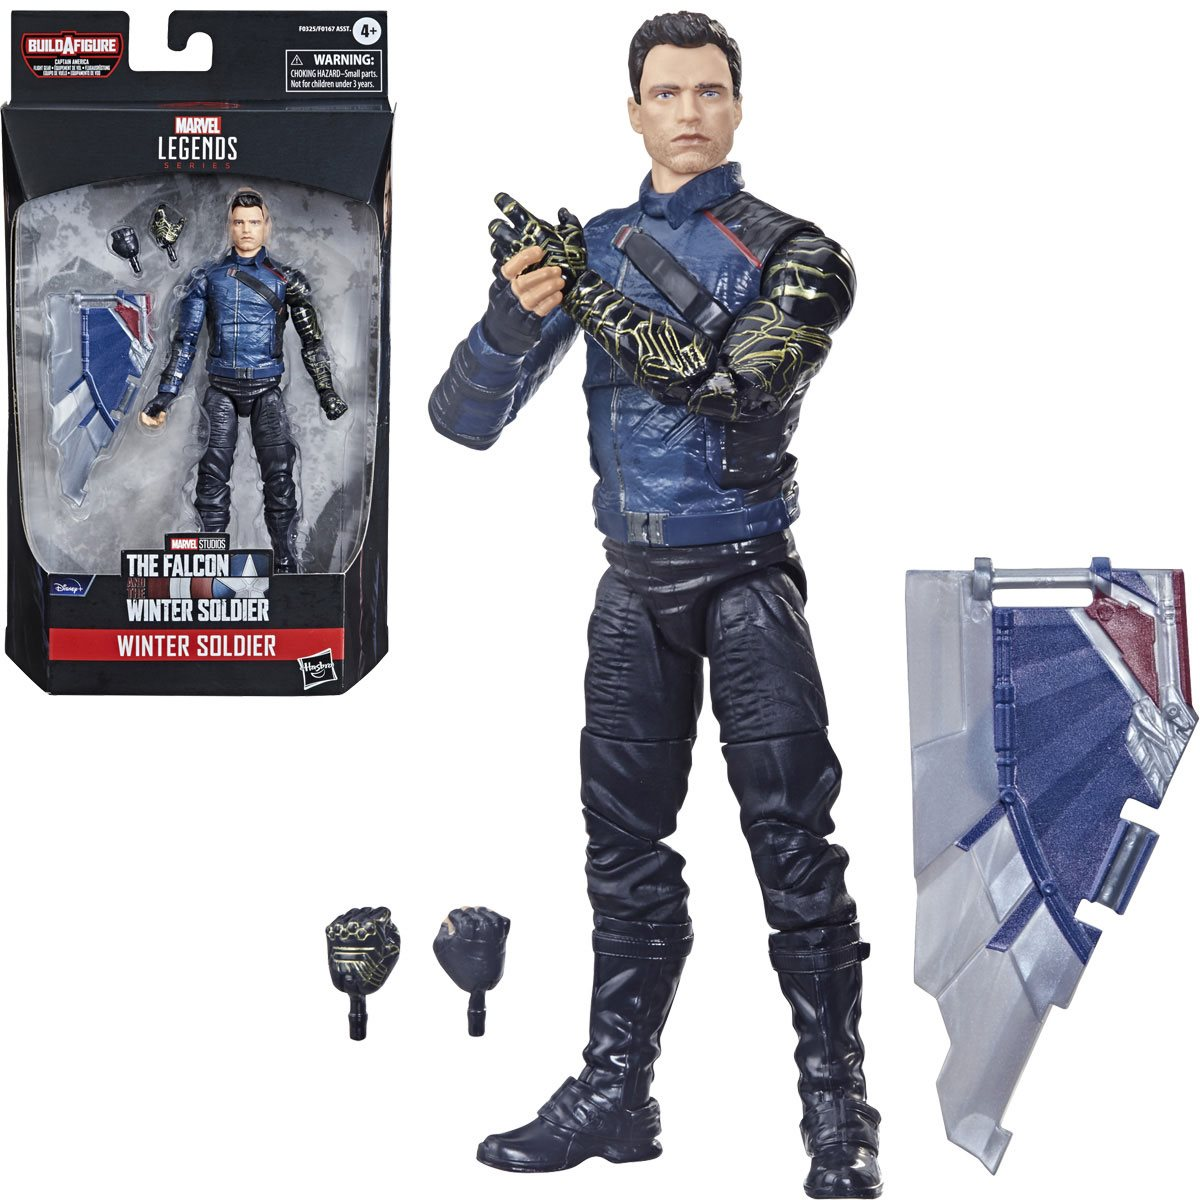 Marvel Legends Winter Soldier 6 Inch Action Figure. Build-A-Figure Cap America Flight Gear.